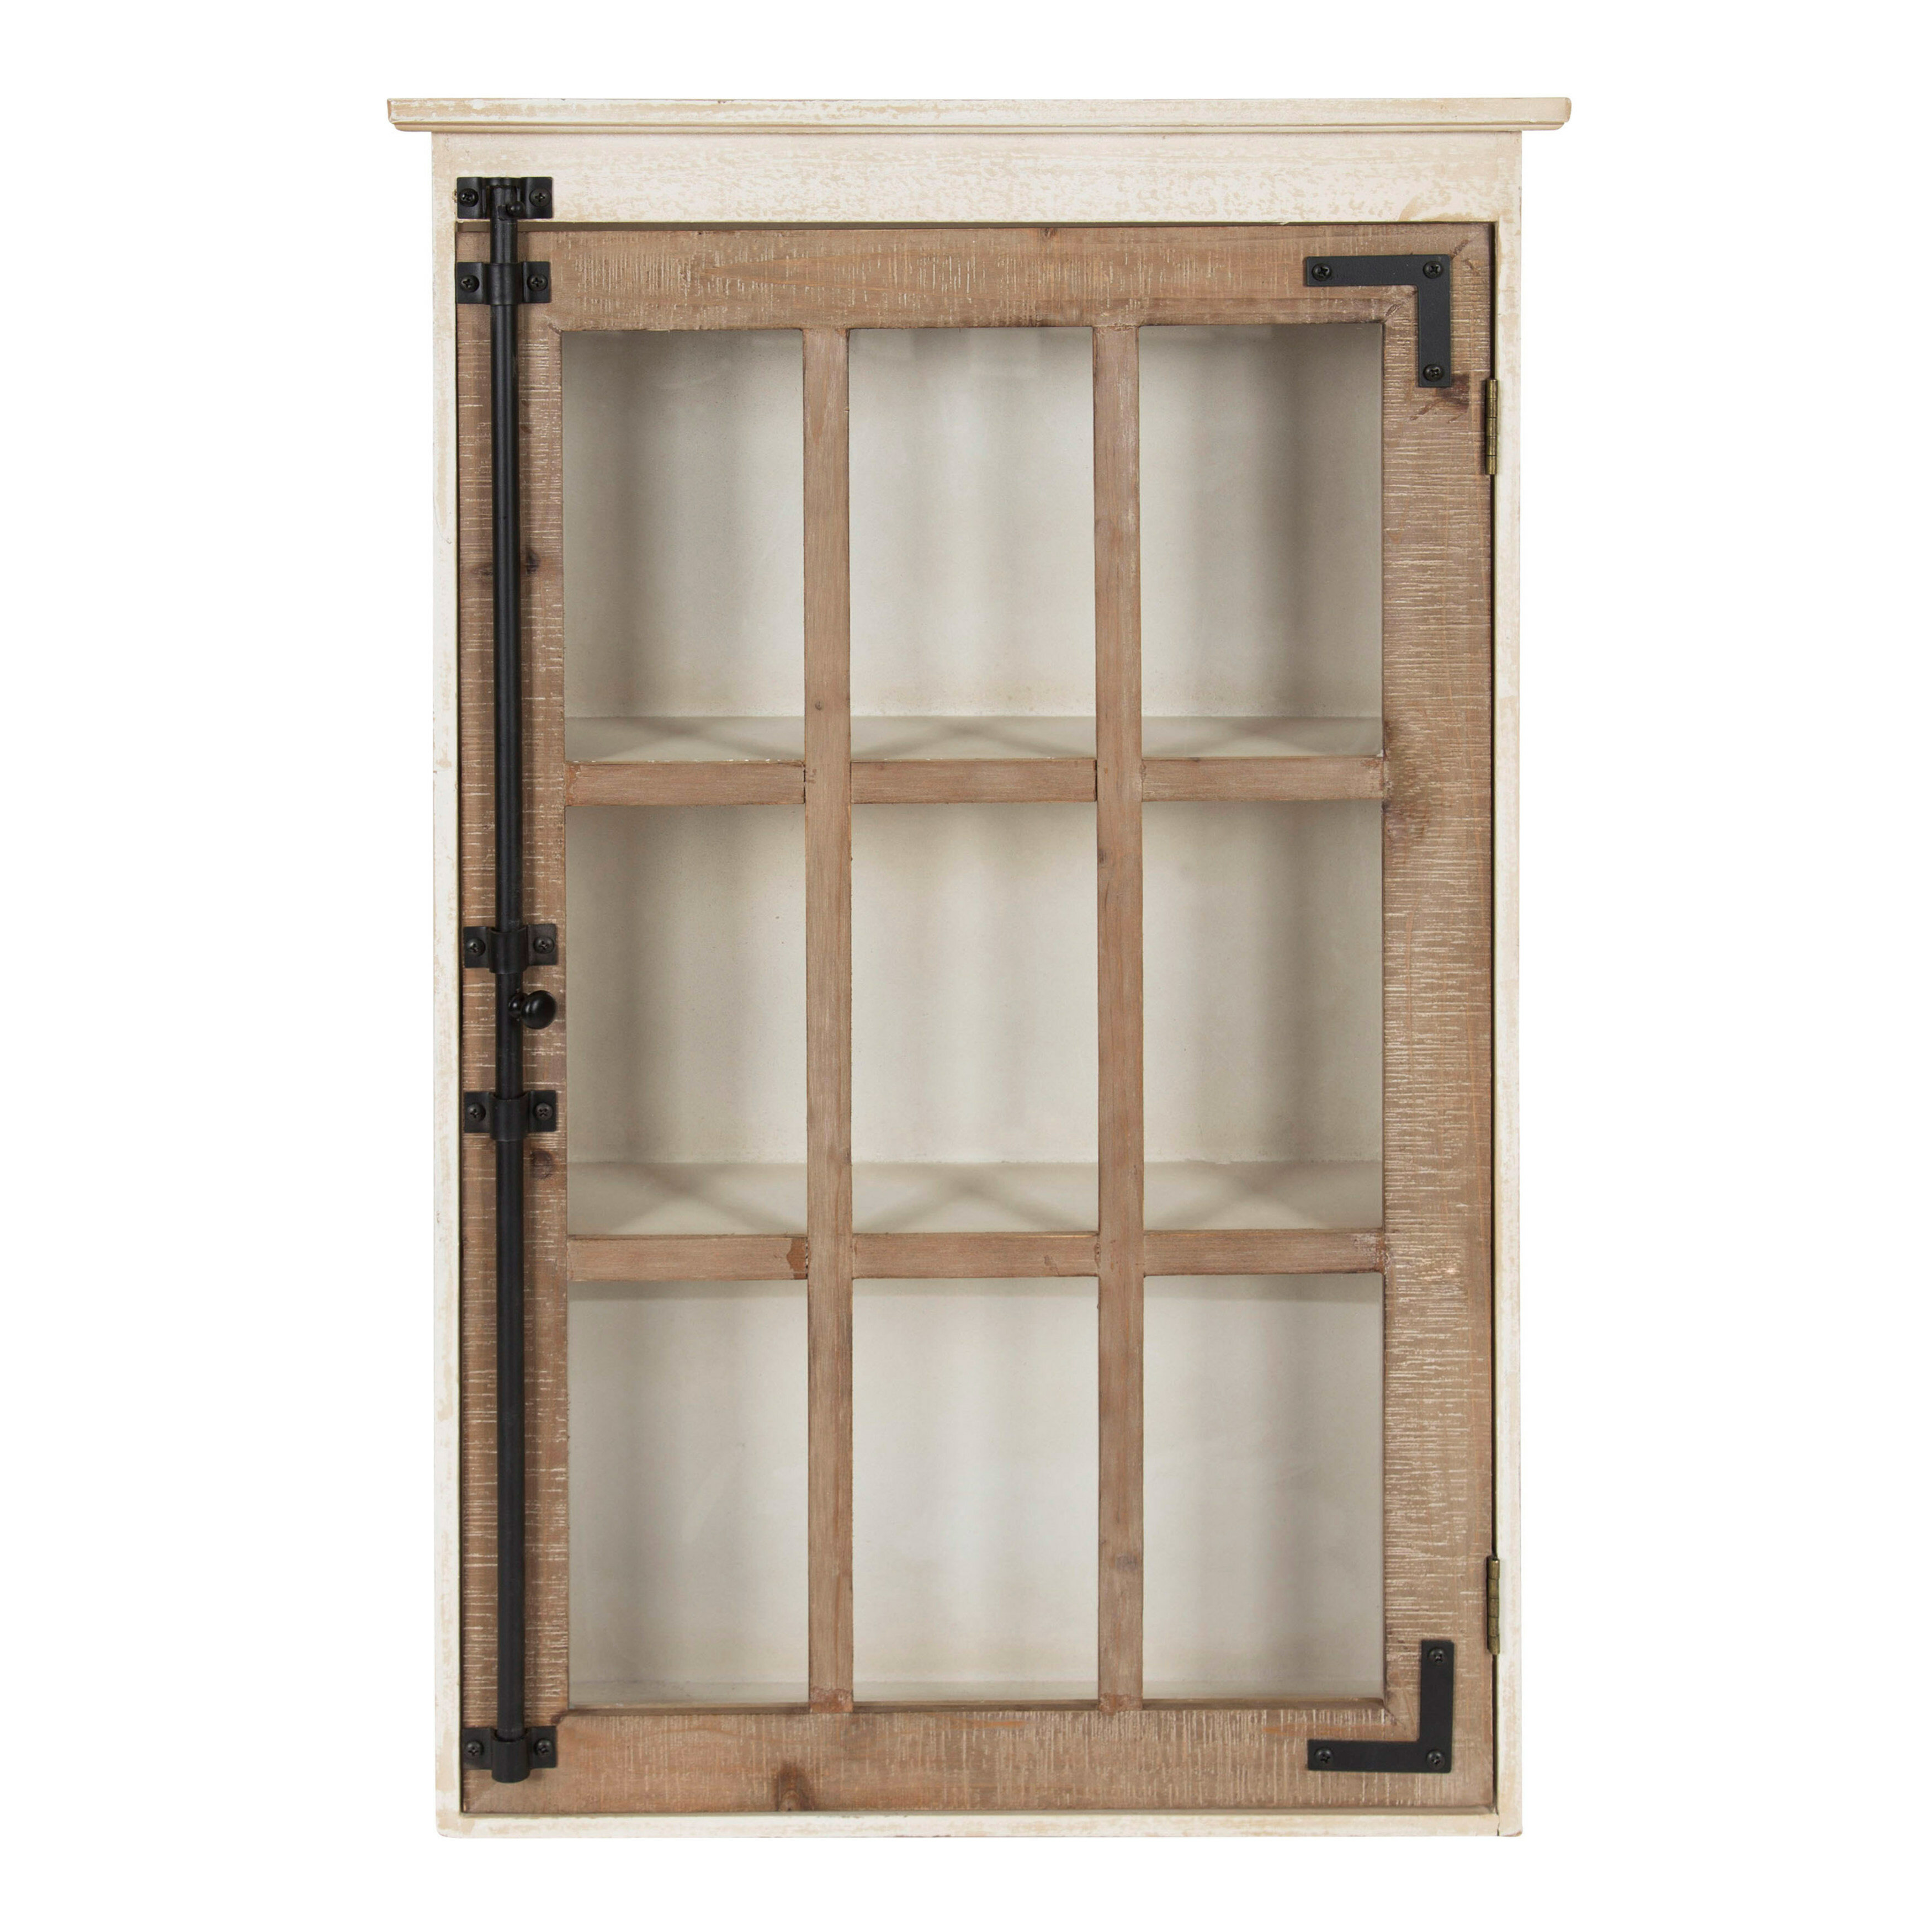 Zofia Farmhouse Cabinet Wall Shelf